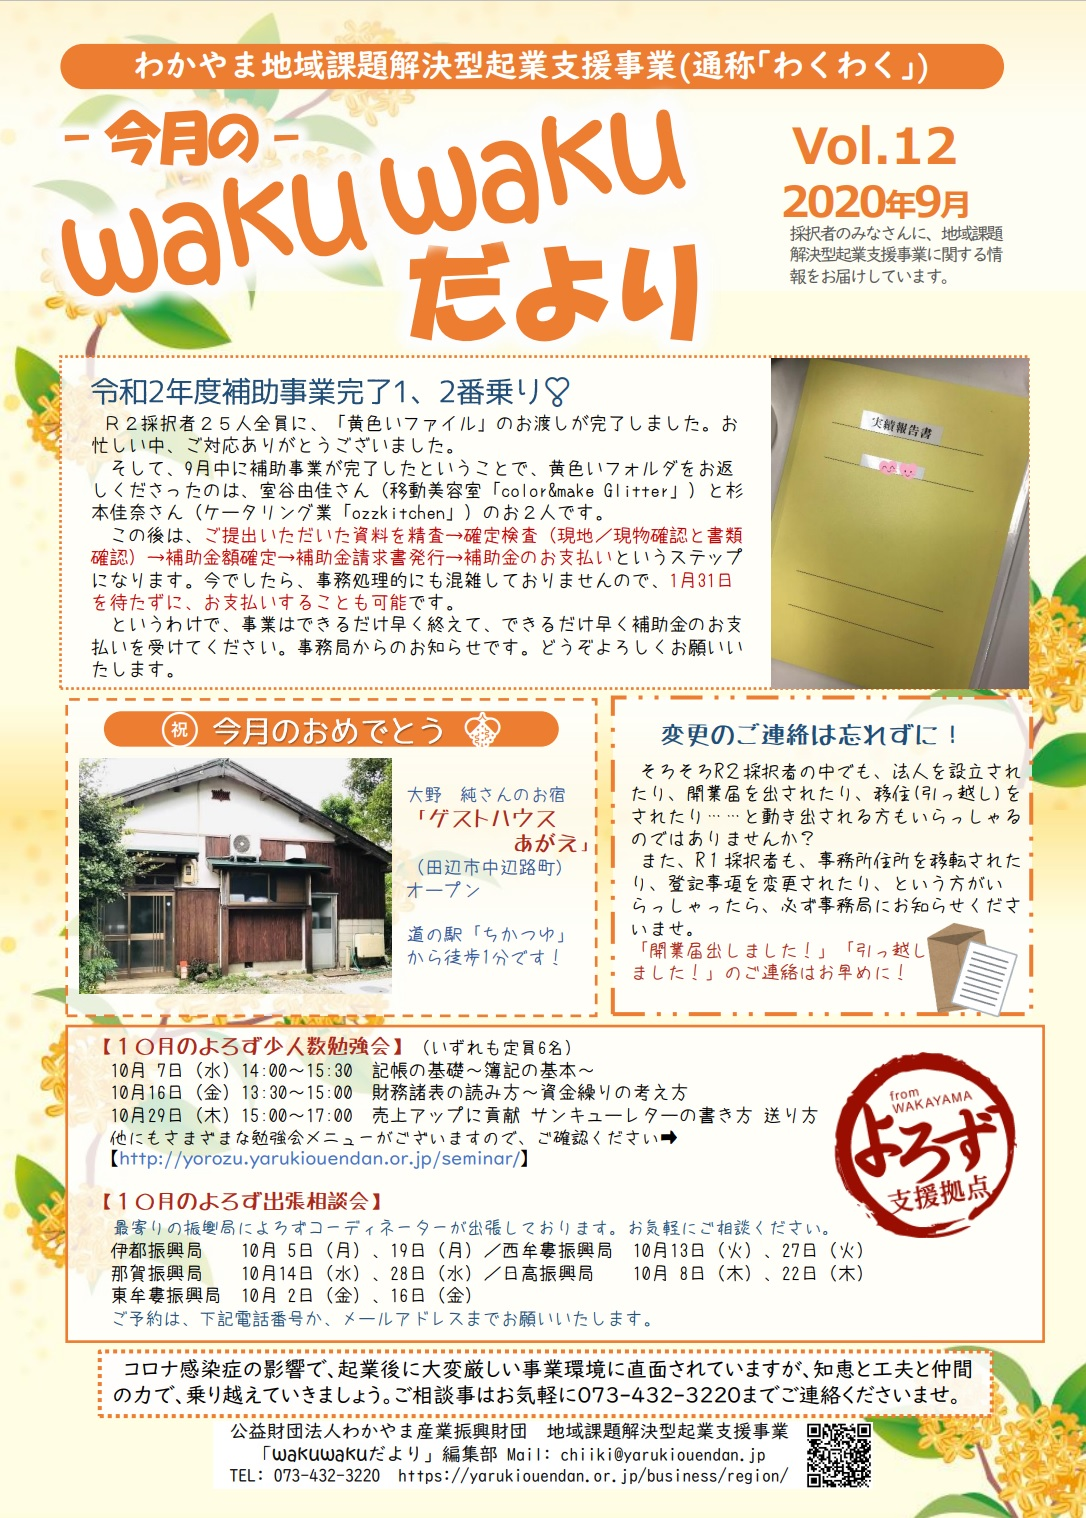 wakuwakuだより Vol.12